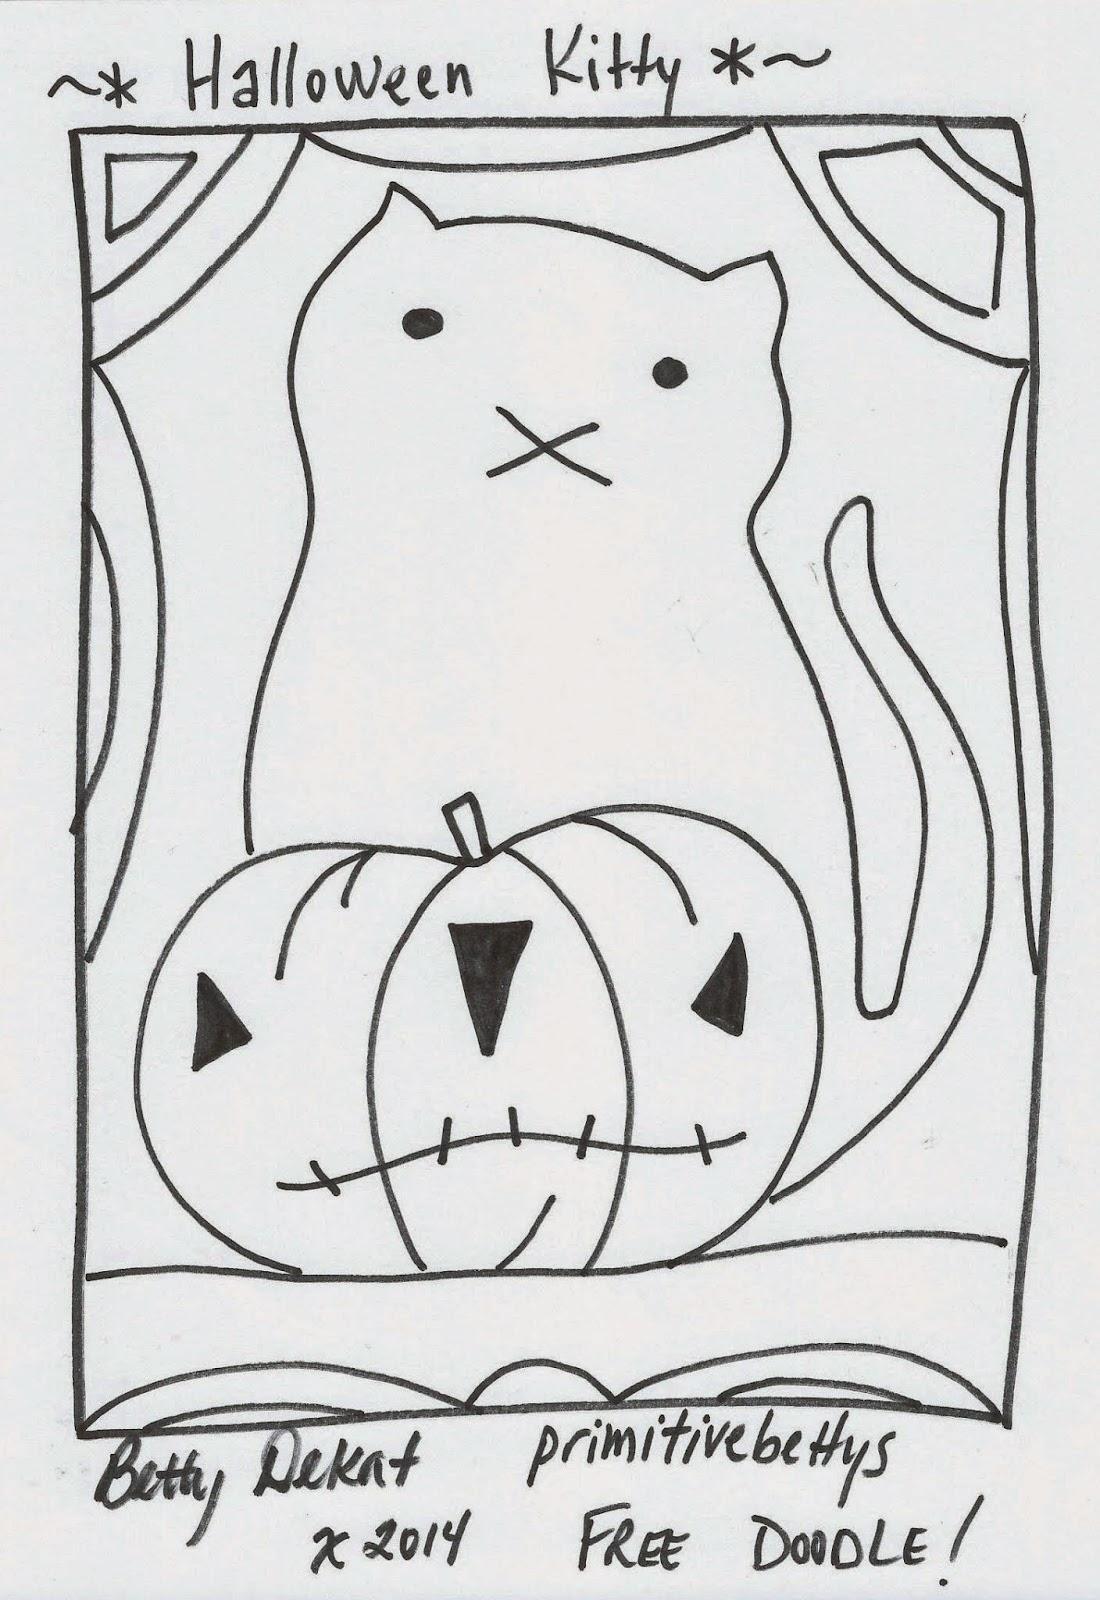 http://1.bp.blogspot.com/-k__ru1SFo8I/VAo2UD4zHyI/AAAAAAAAIrg/v0cE-4dnyLk/s1600/Halloween%2BKitty.jpg